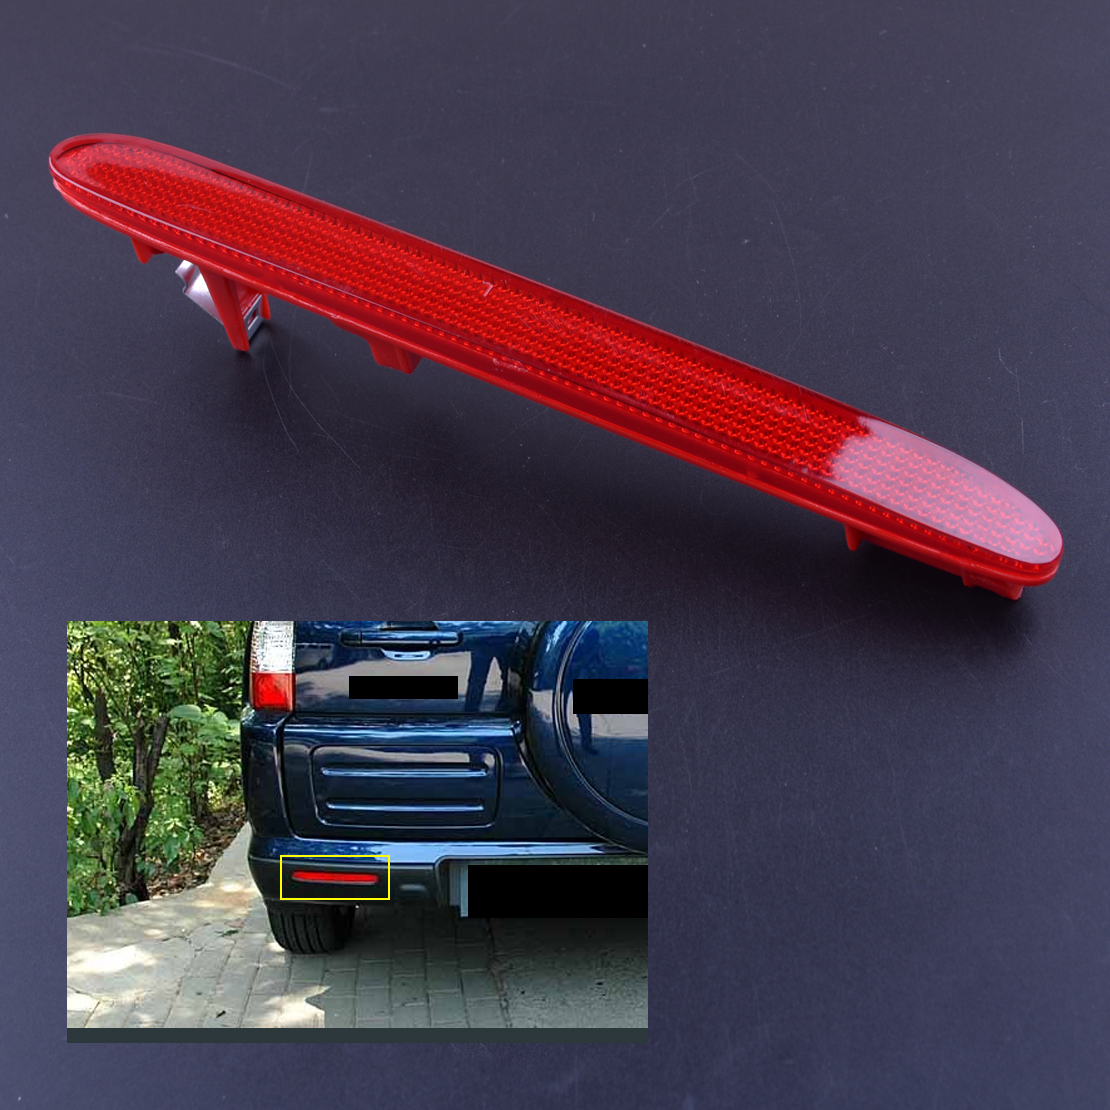 CITALL Rear Left Reflector Light Bumper Face Bar Tail Brake Parking Warning Lamp 33555-SEA-013 For Honda CRV Element Acura TSX